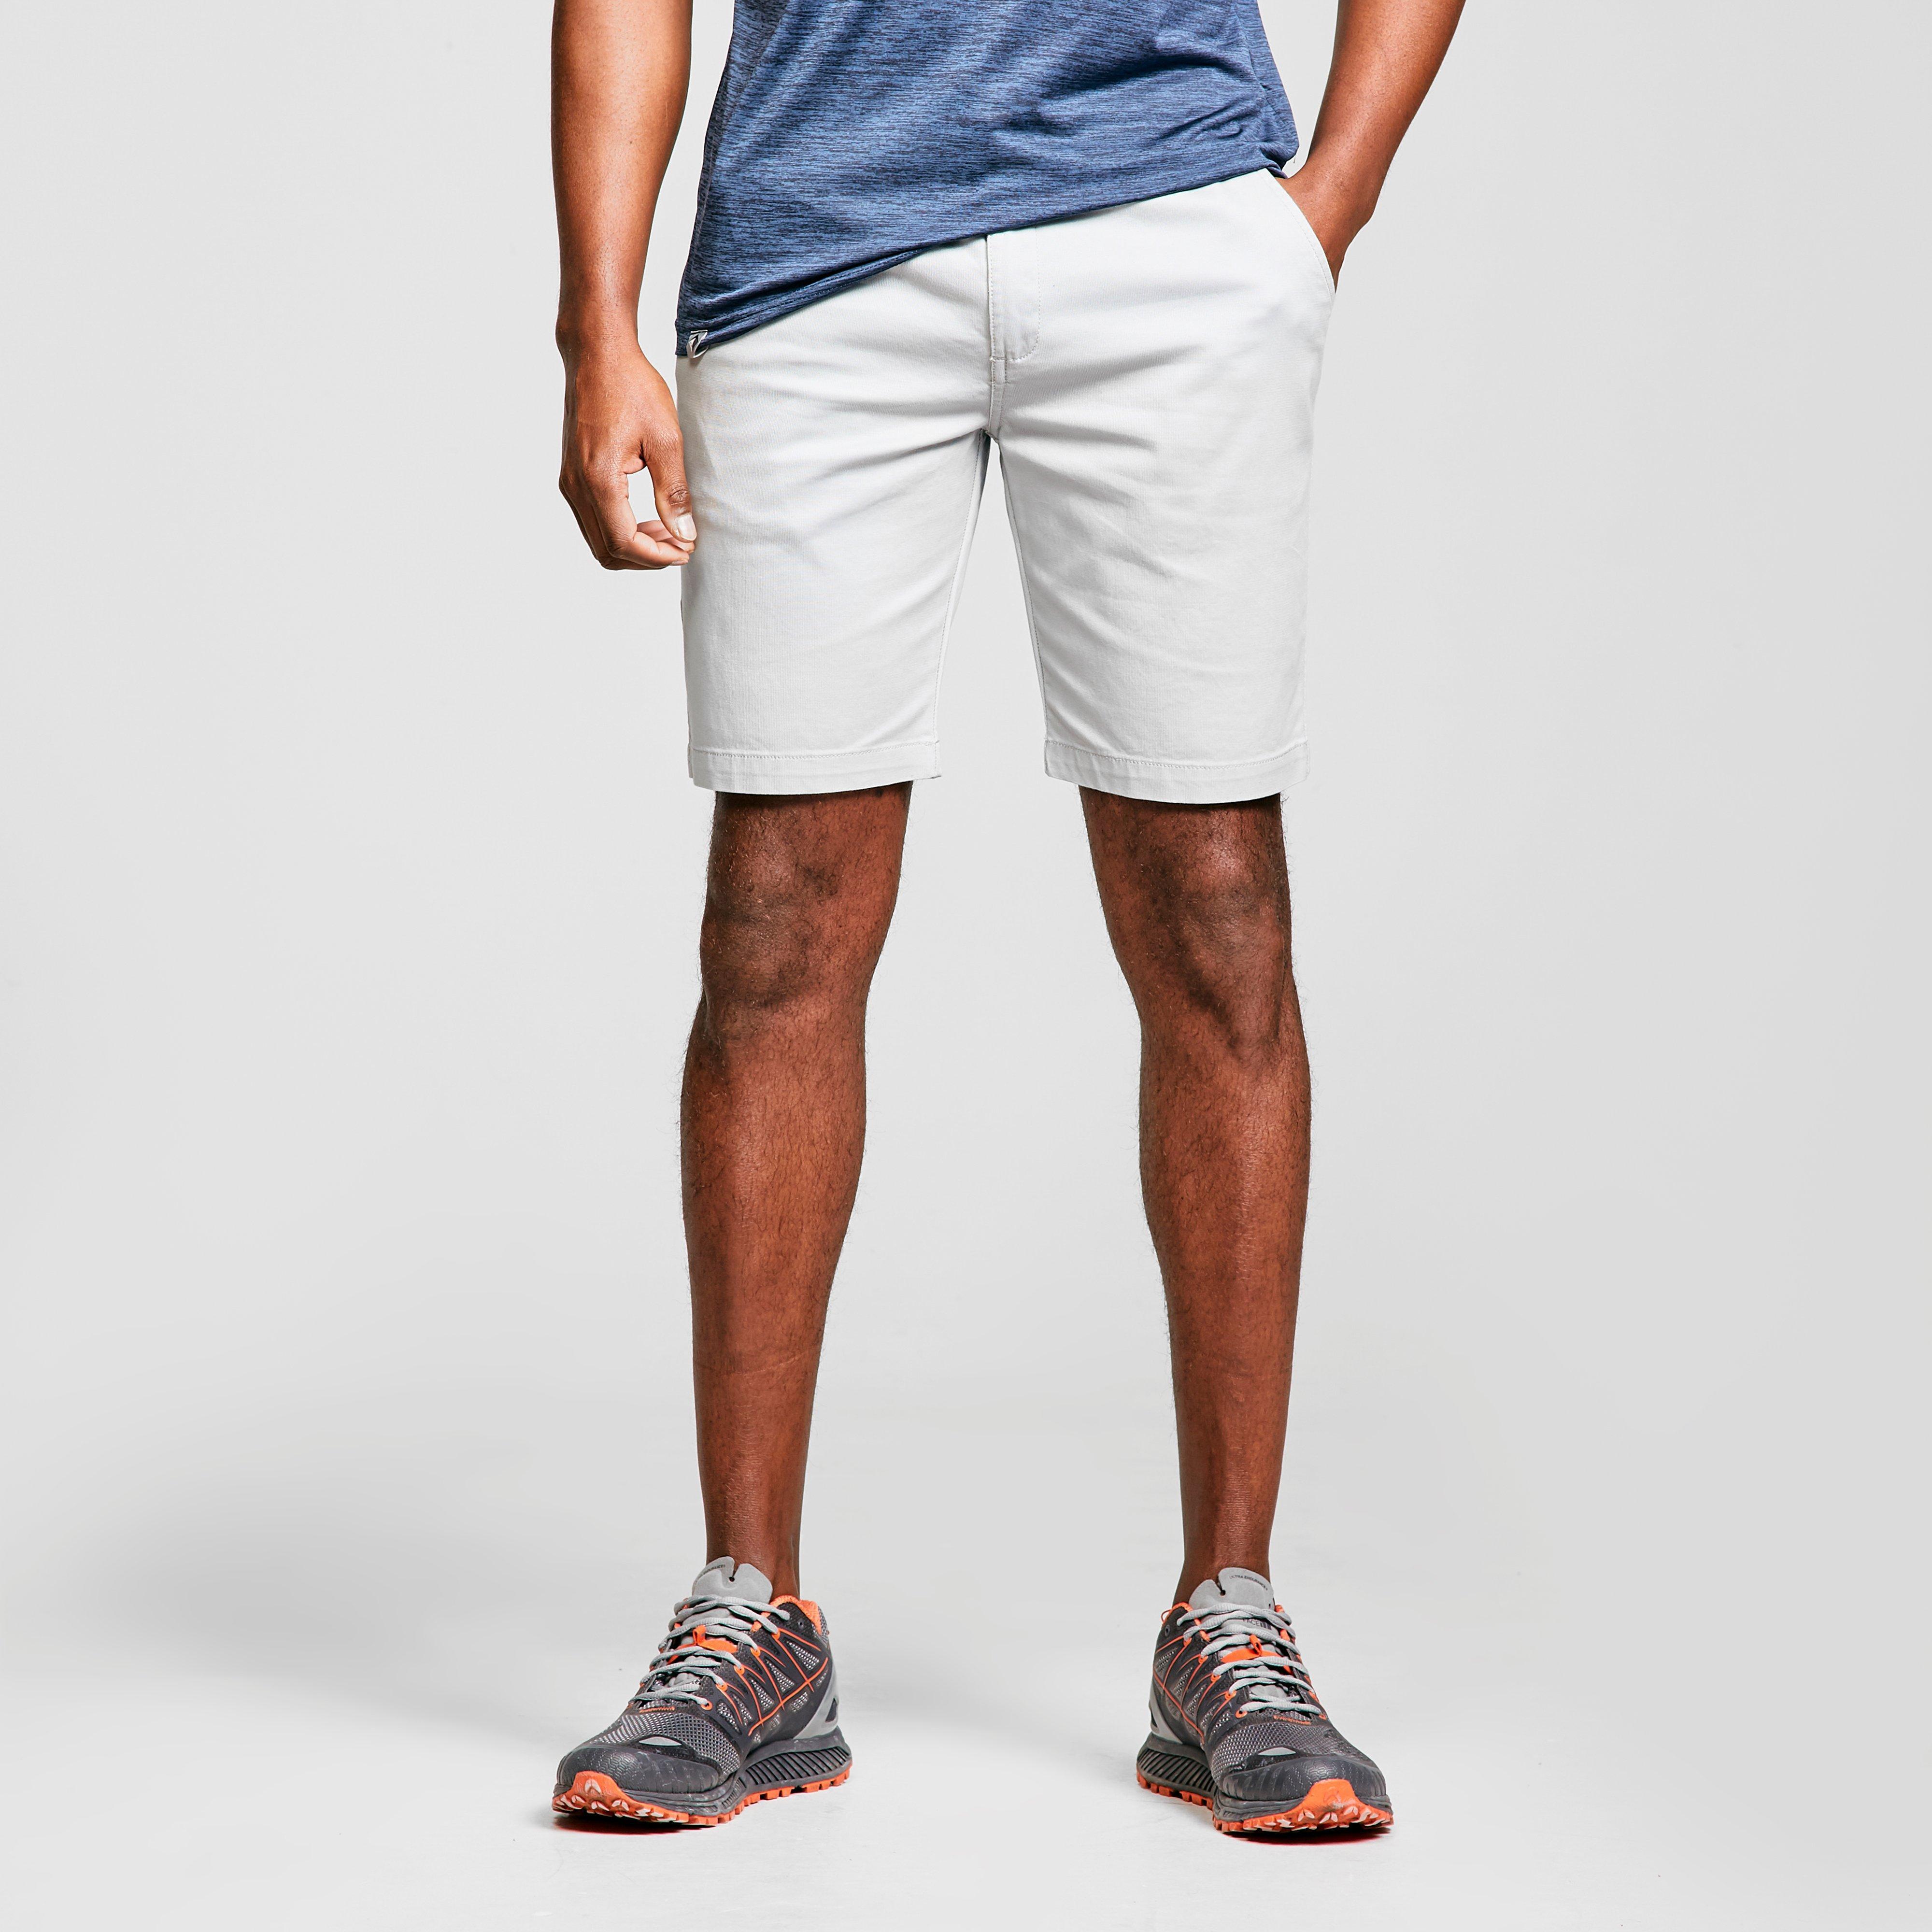 Regatta Men's Albie Chino Shorts - Gry/Gry, Grey